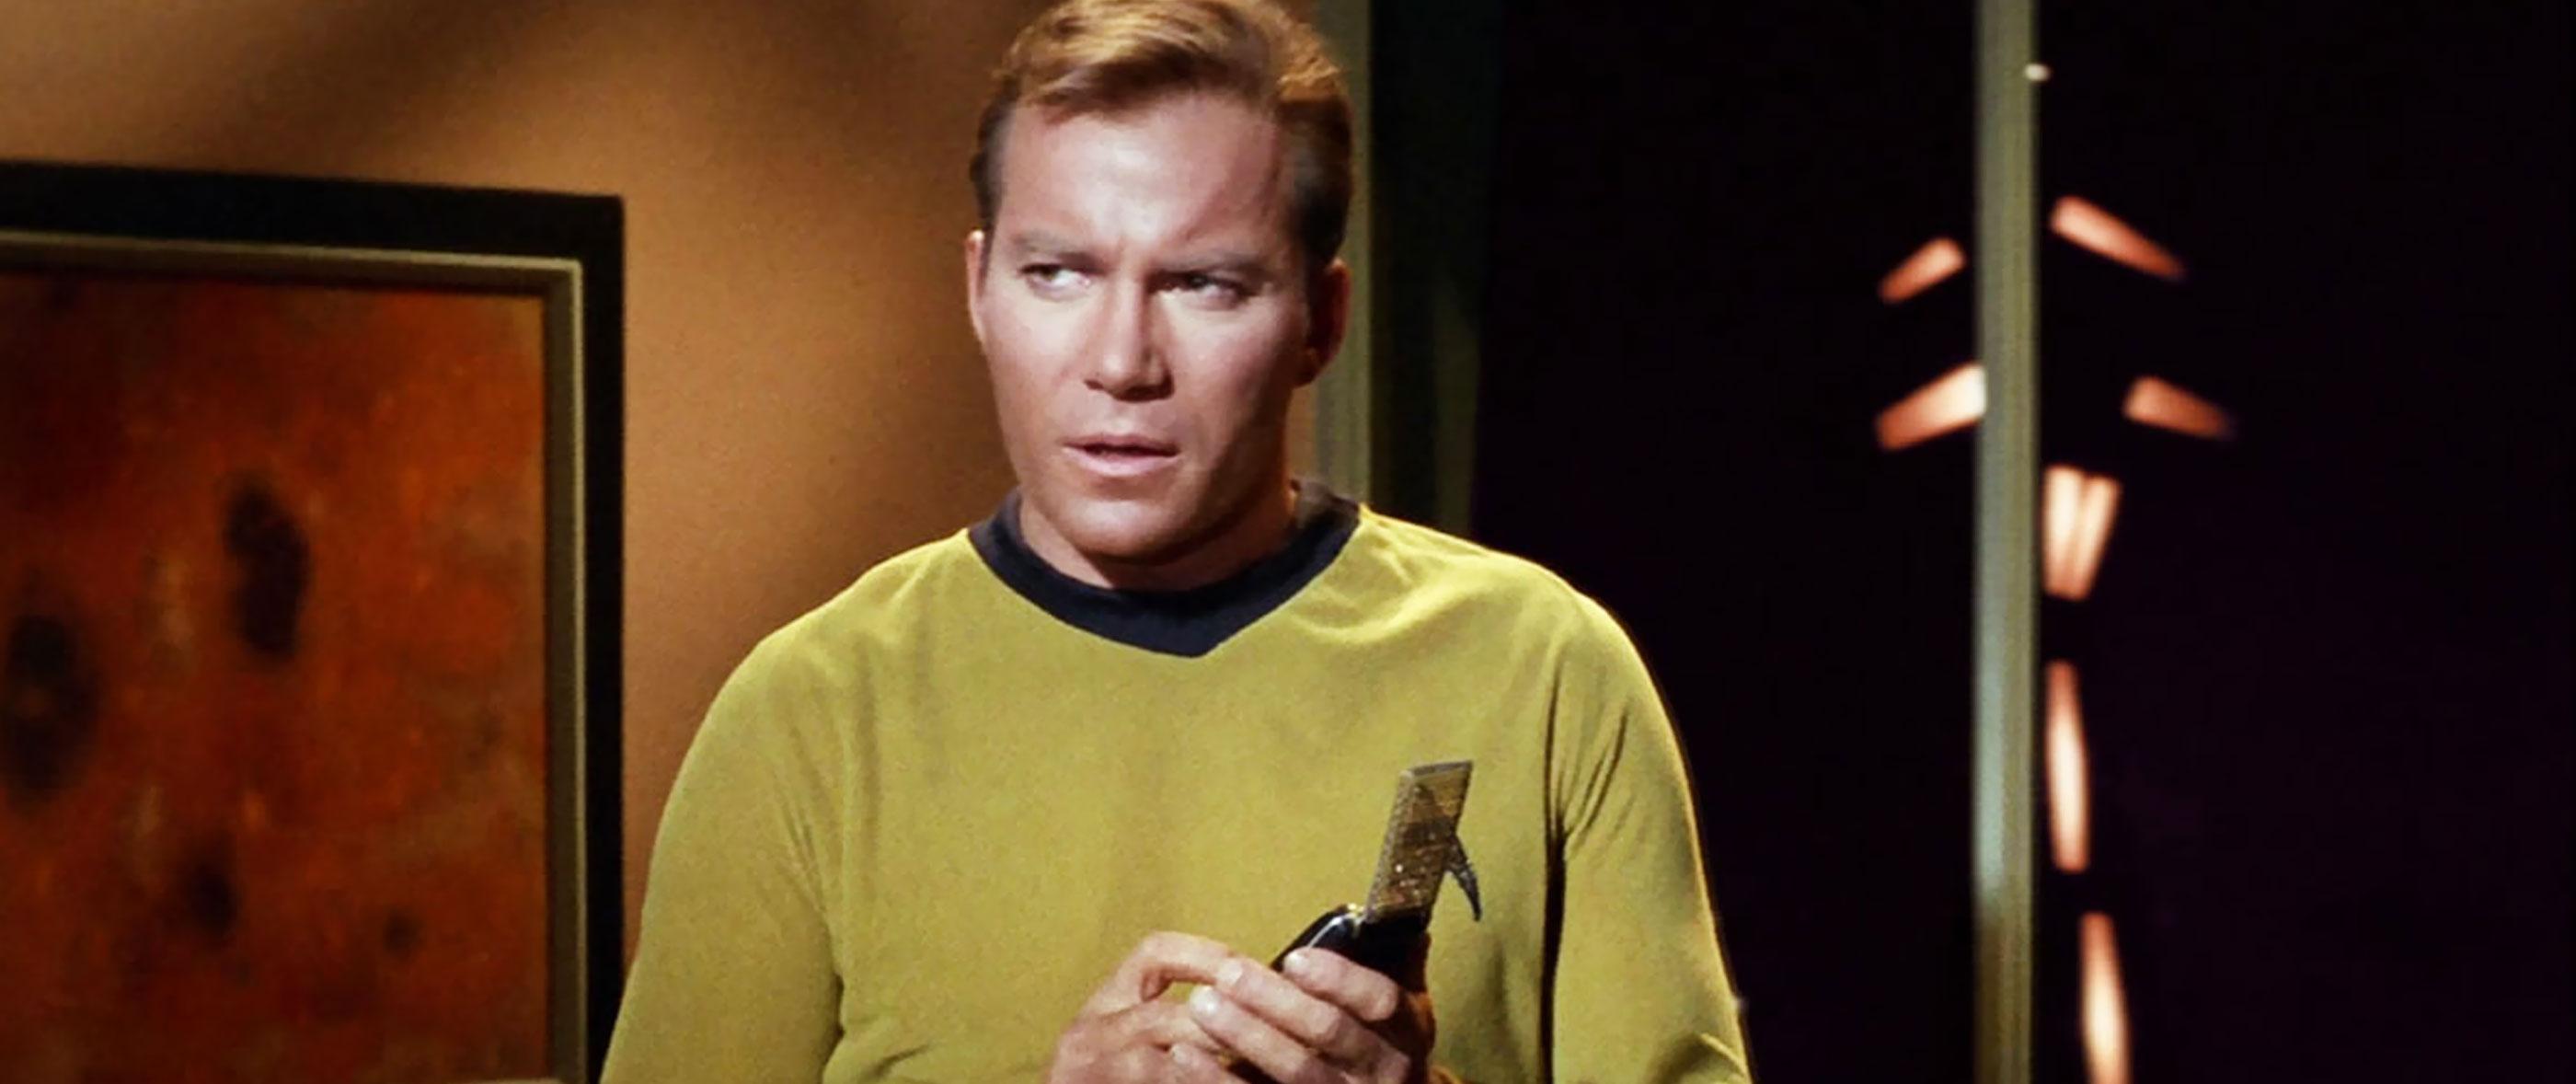 Captain Kirk Using a Communicator